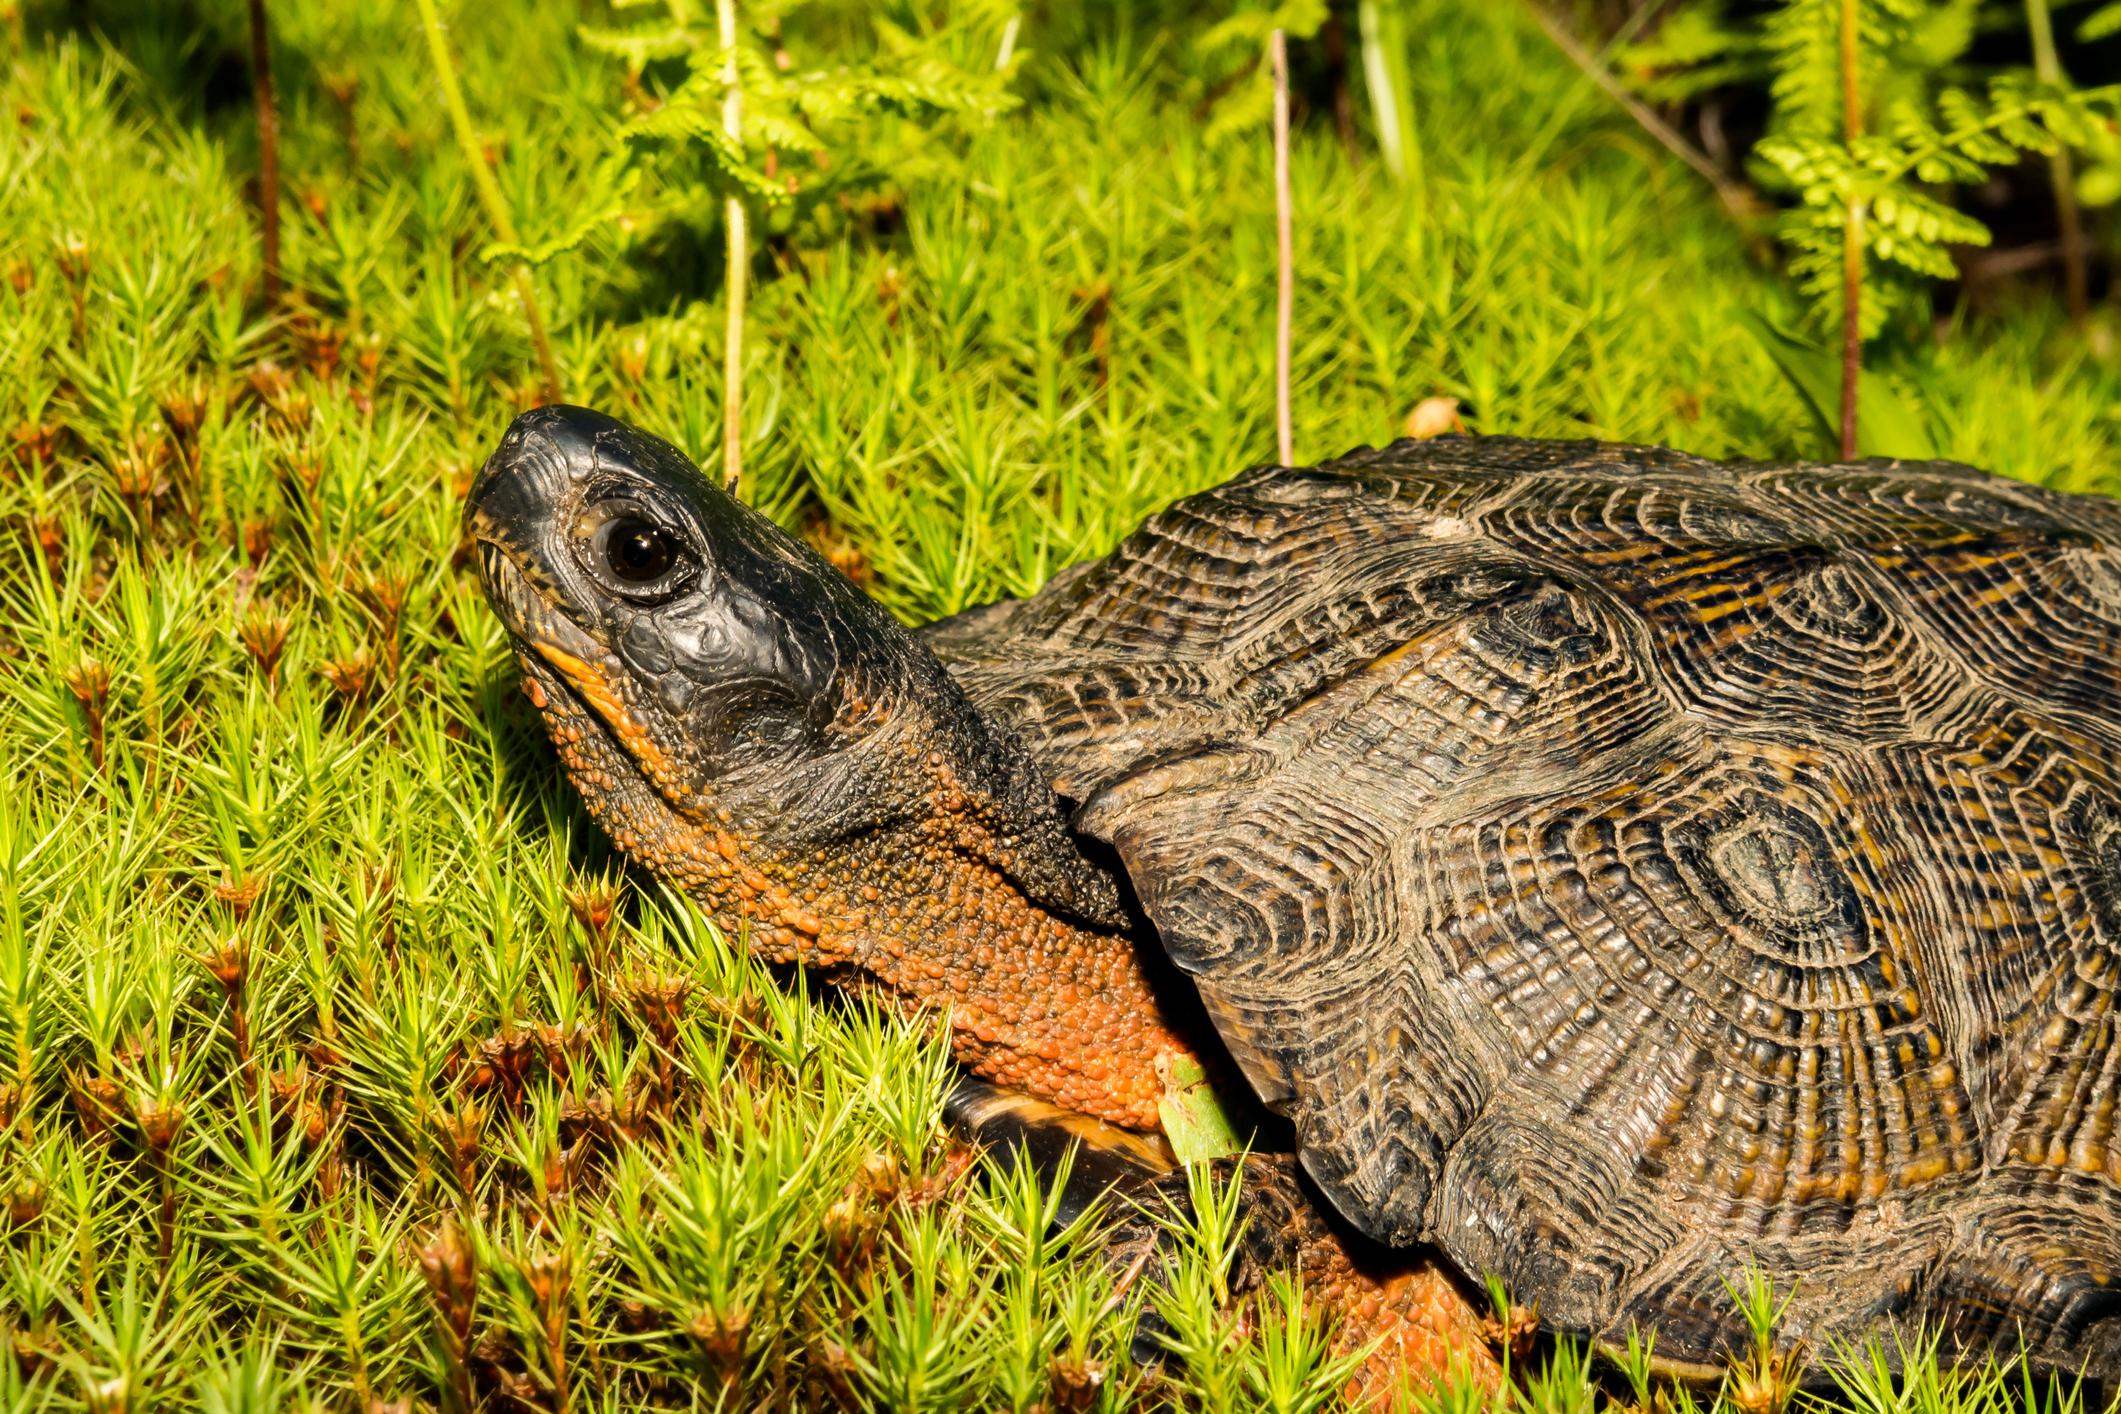 Wood Turtle sunning itself at the Virginia Zoo